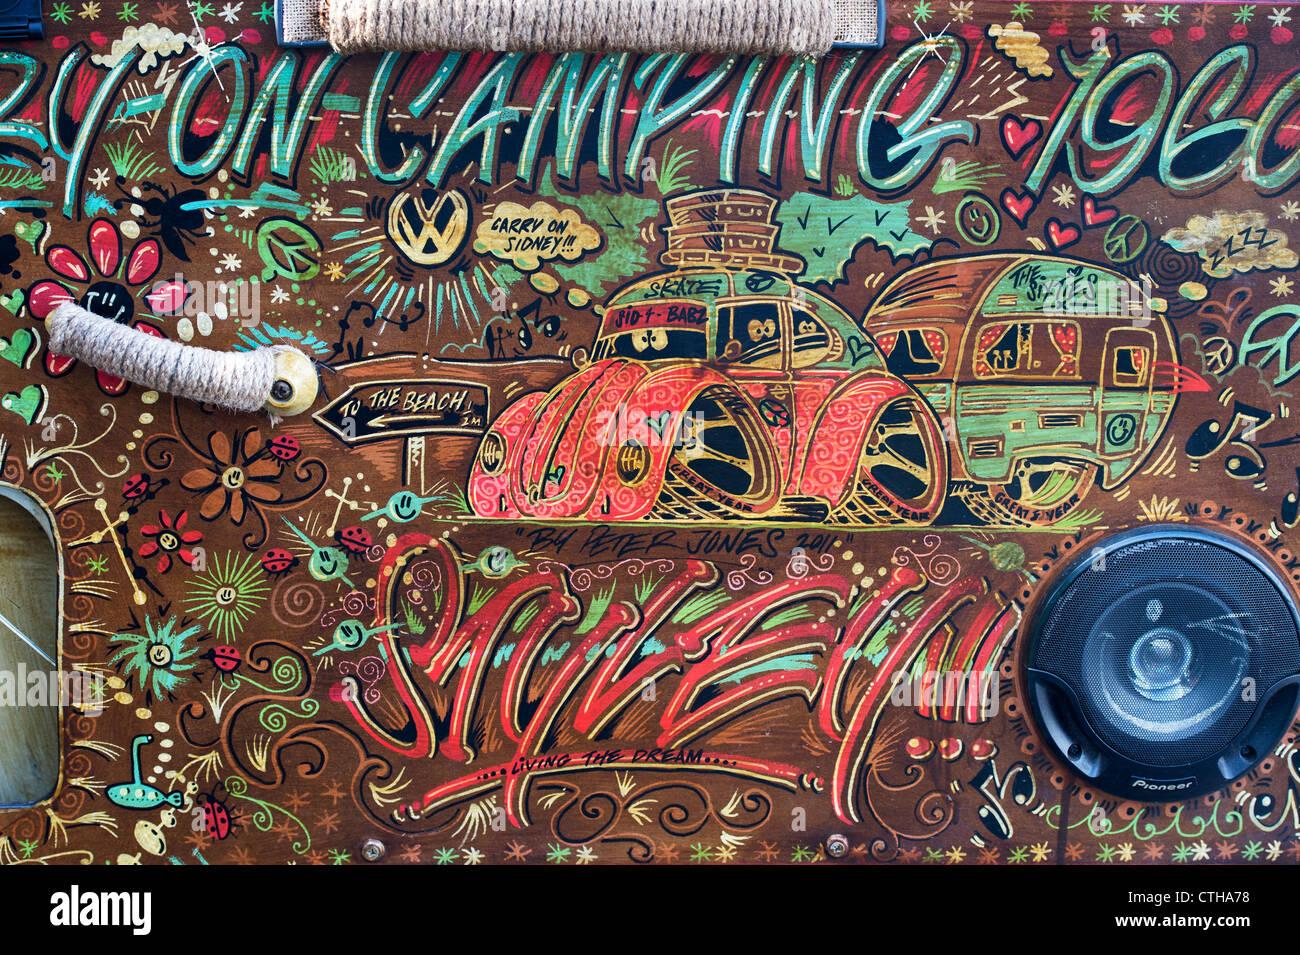 cran partag vw volkswagen camper van intrieur en bois peint en 1960 annes 70 style hippie